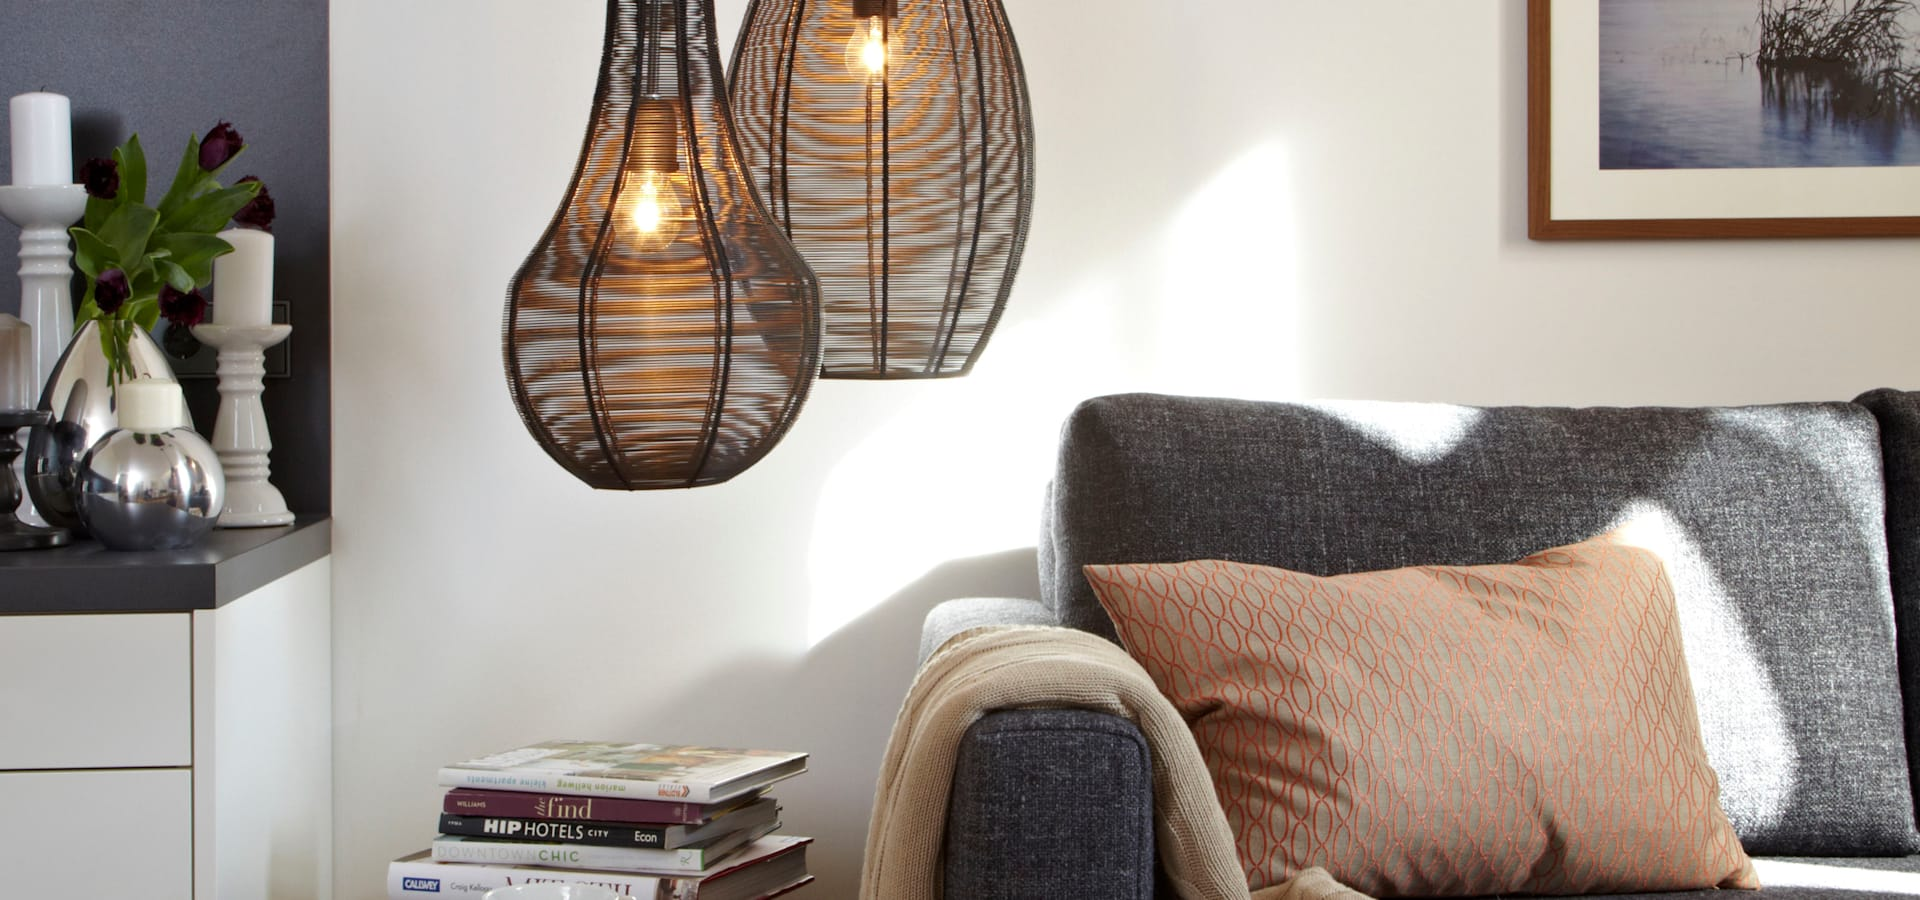 sofa flieder blumen 01 por ute g nther wachgek sst homify. Black Bedroom Furniture Sets. Home Design Ideas